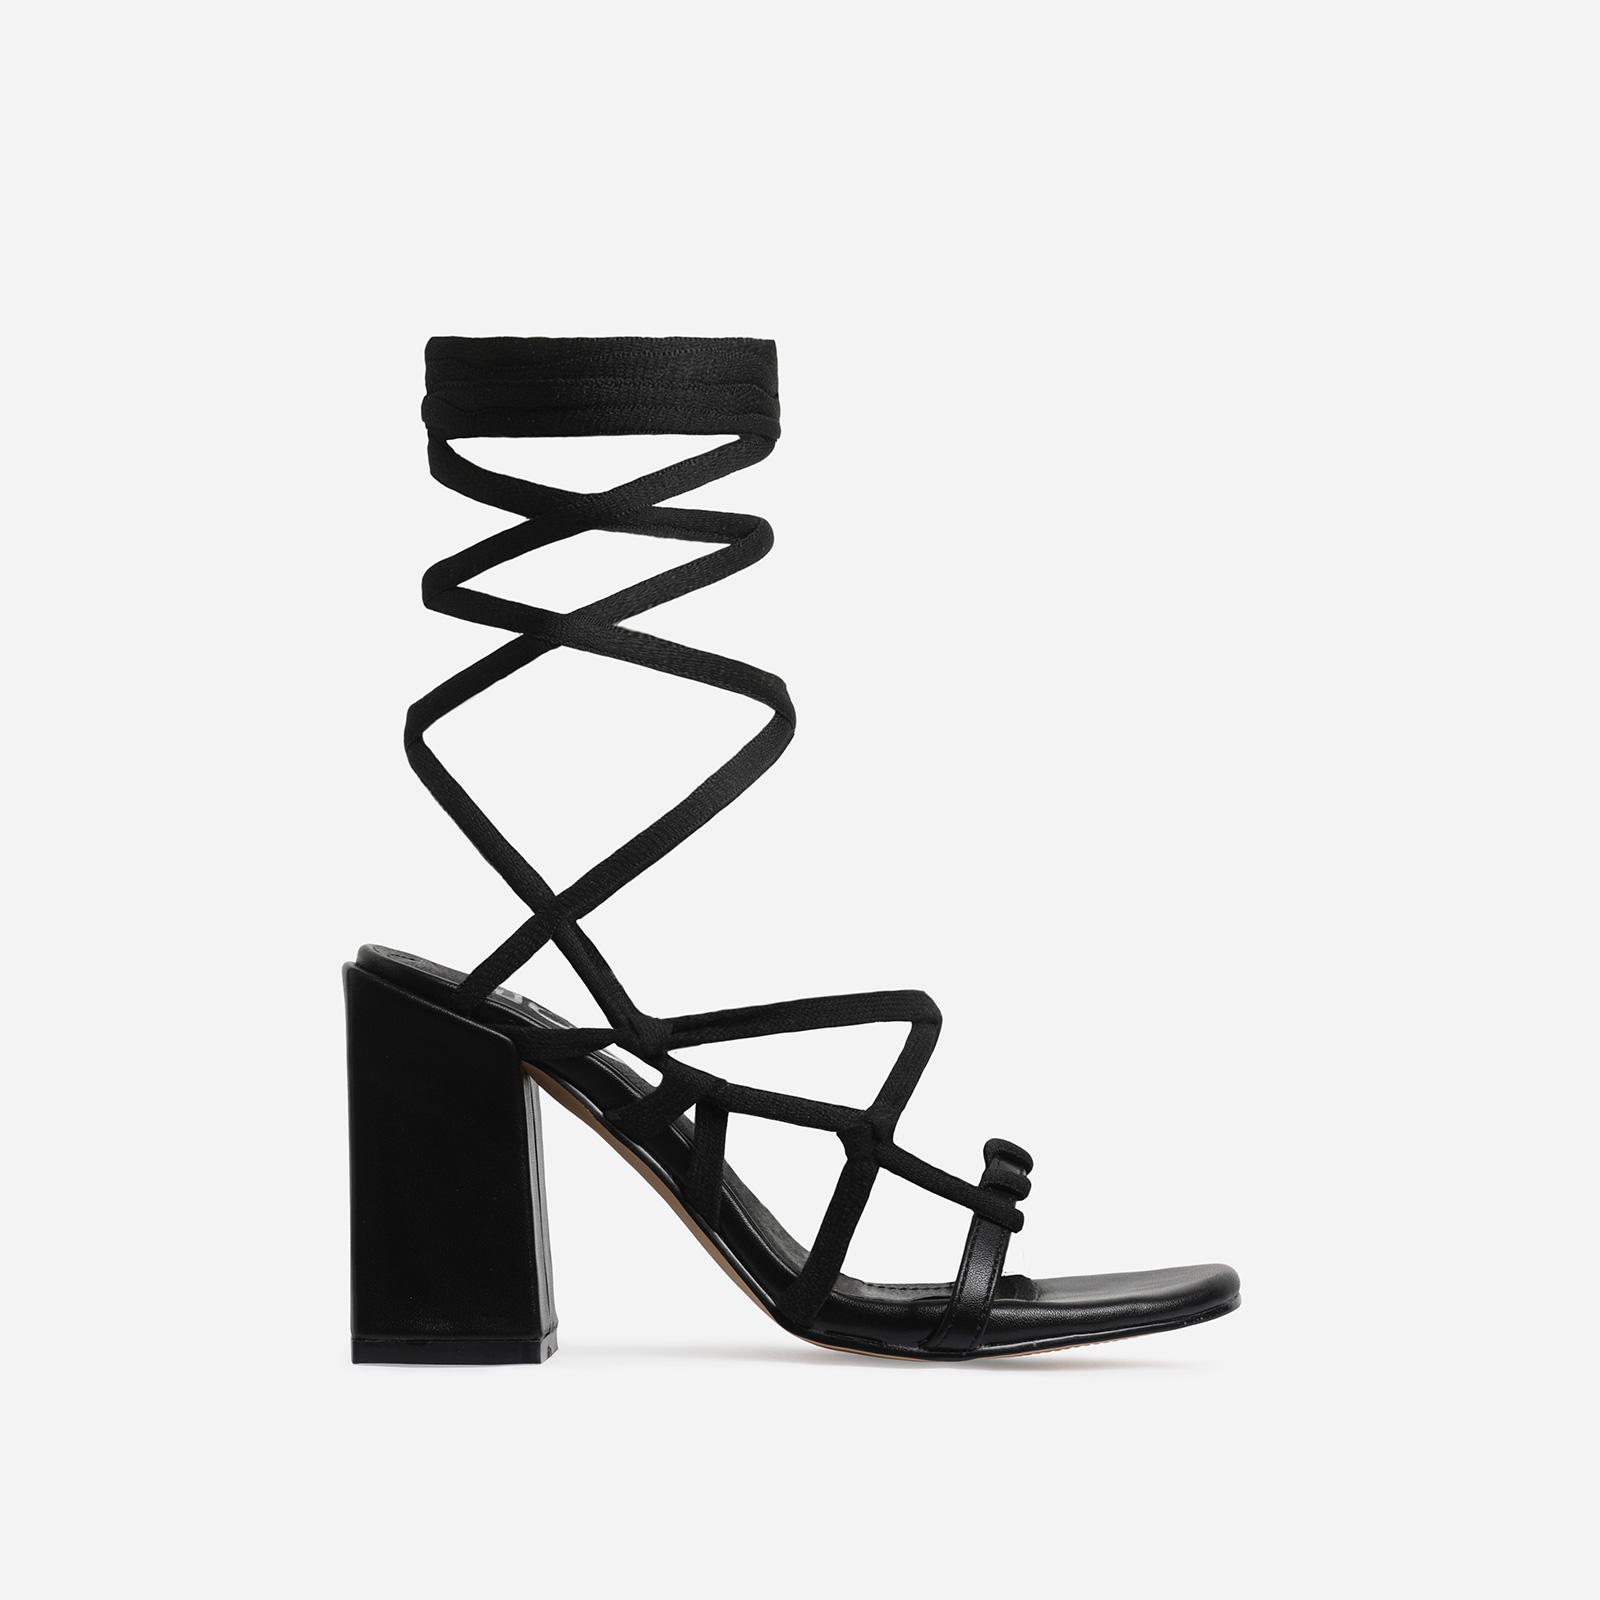 Erzi Square Toe Lace Up Block Heel In Black Faux Leather